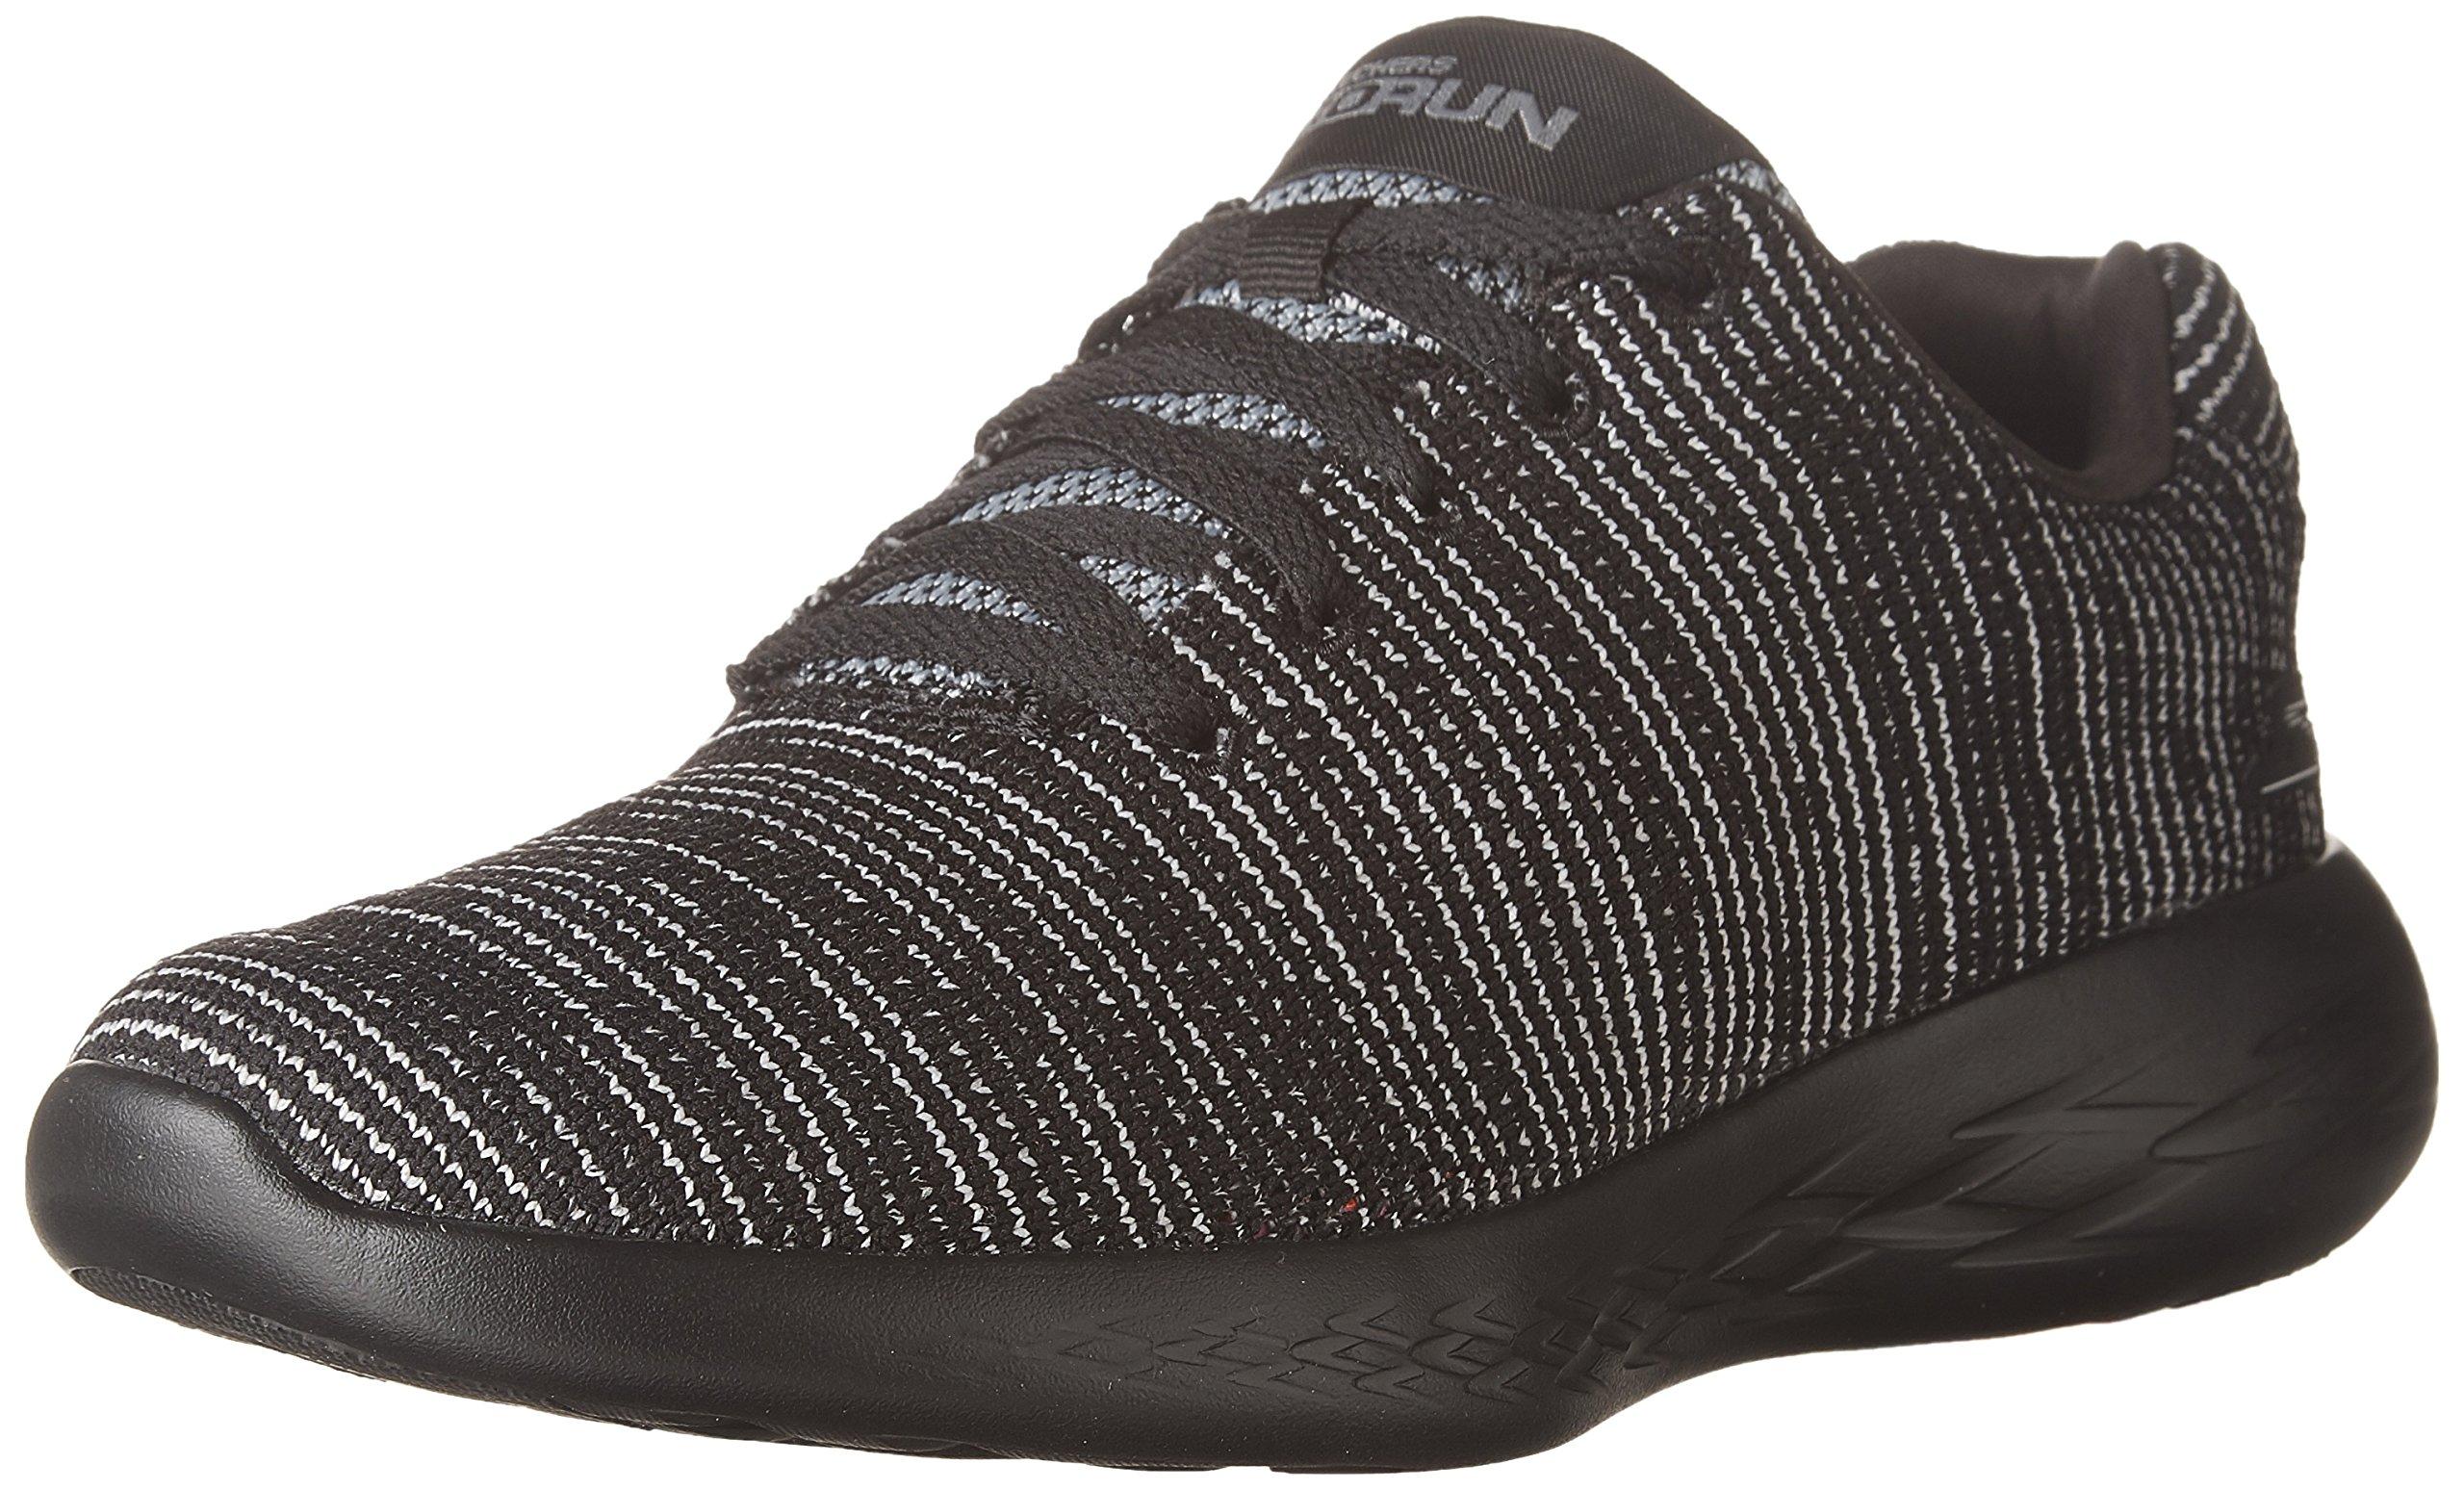 Skechers Performance Women's Go Run 600-Obtain Sneaker,Black/Gray,11 M US